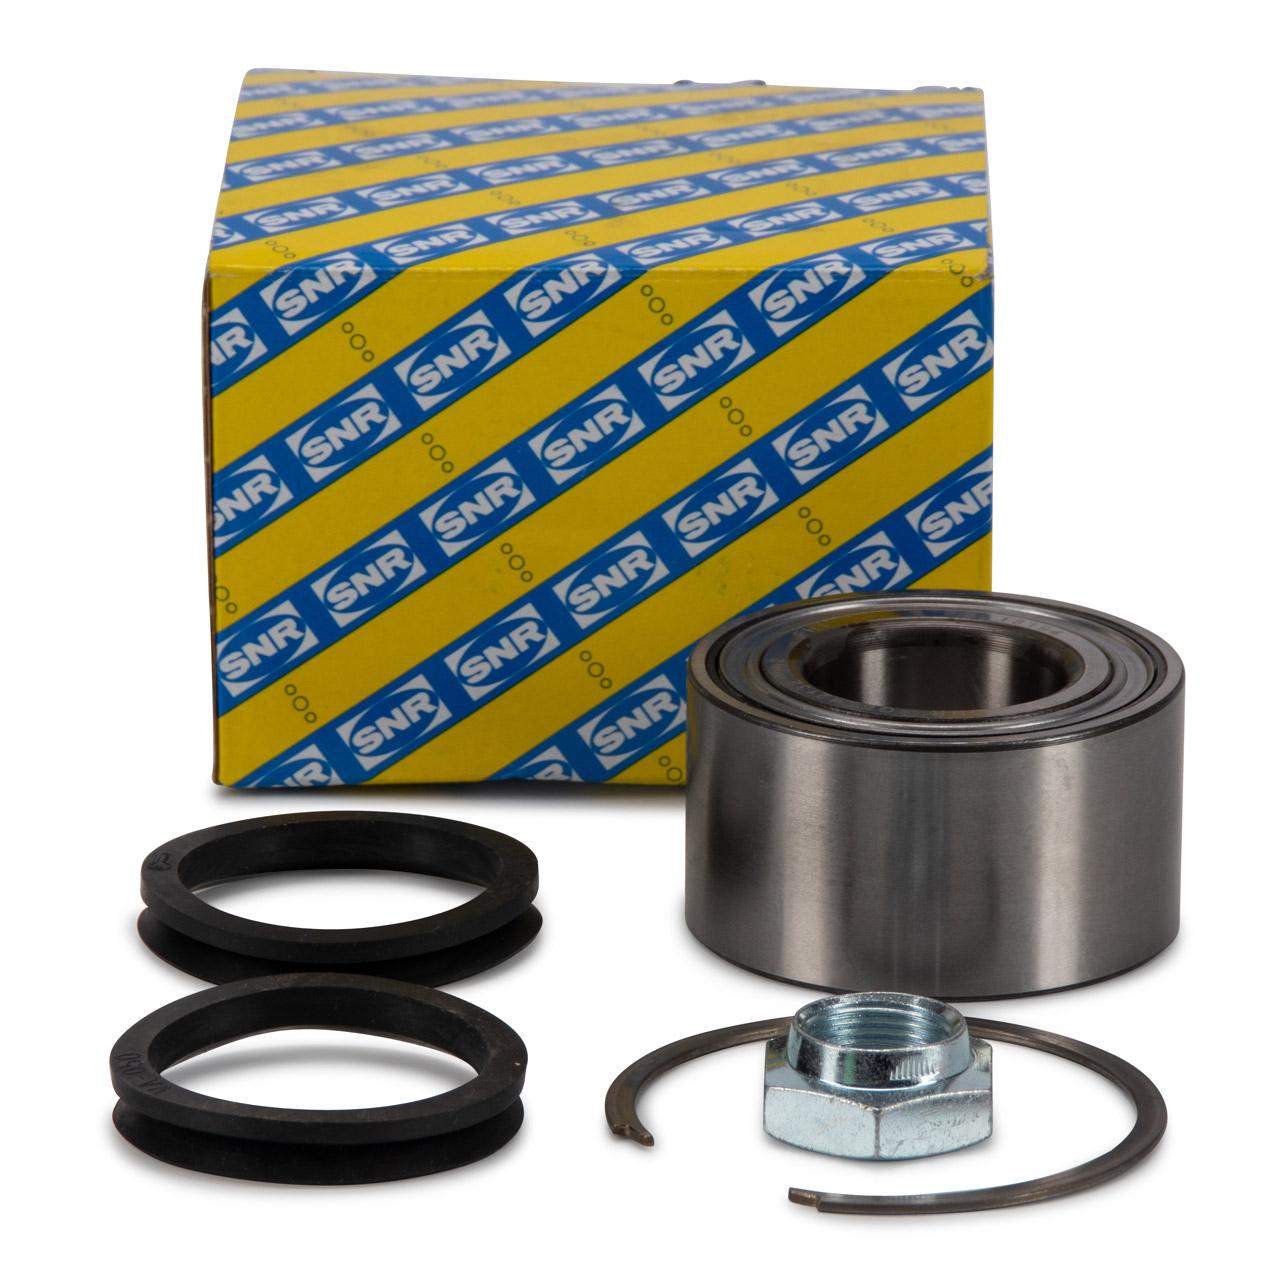 SNR R182.60 Radlagersatz SEAT Ibiza I Malaga Ronda 0.9-1.6 1.7D vorne